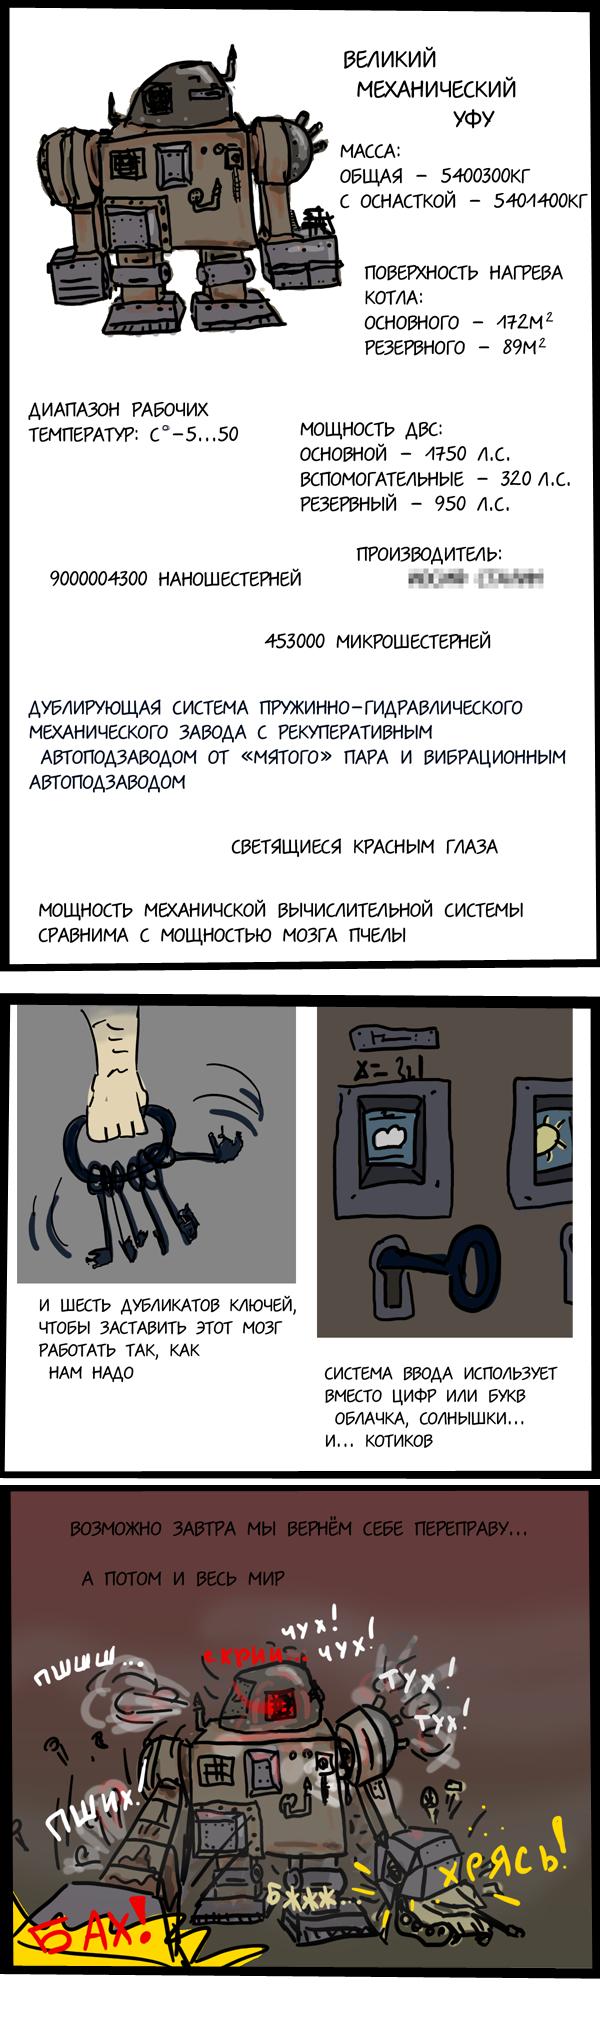 Комикс битва №16 выпуск 177